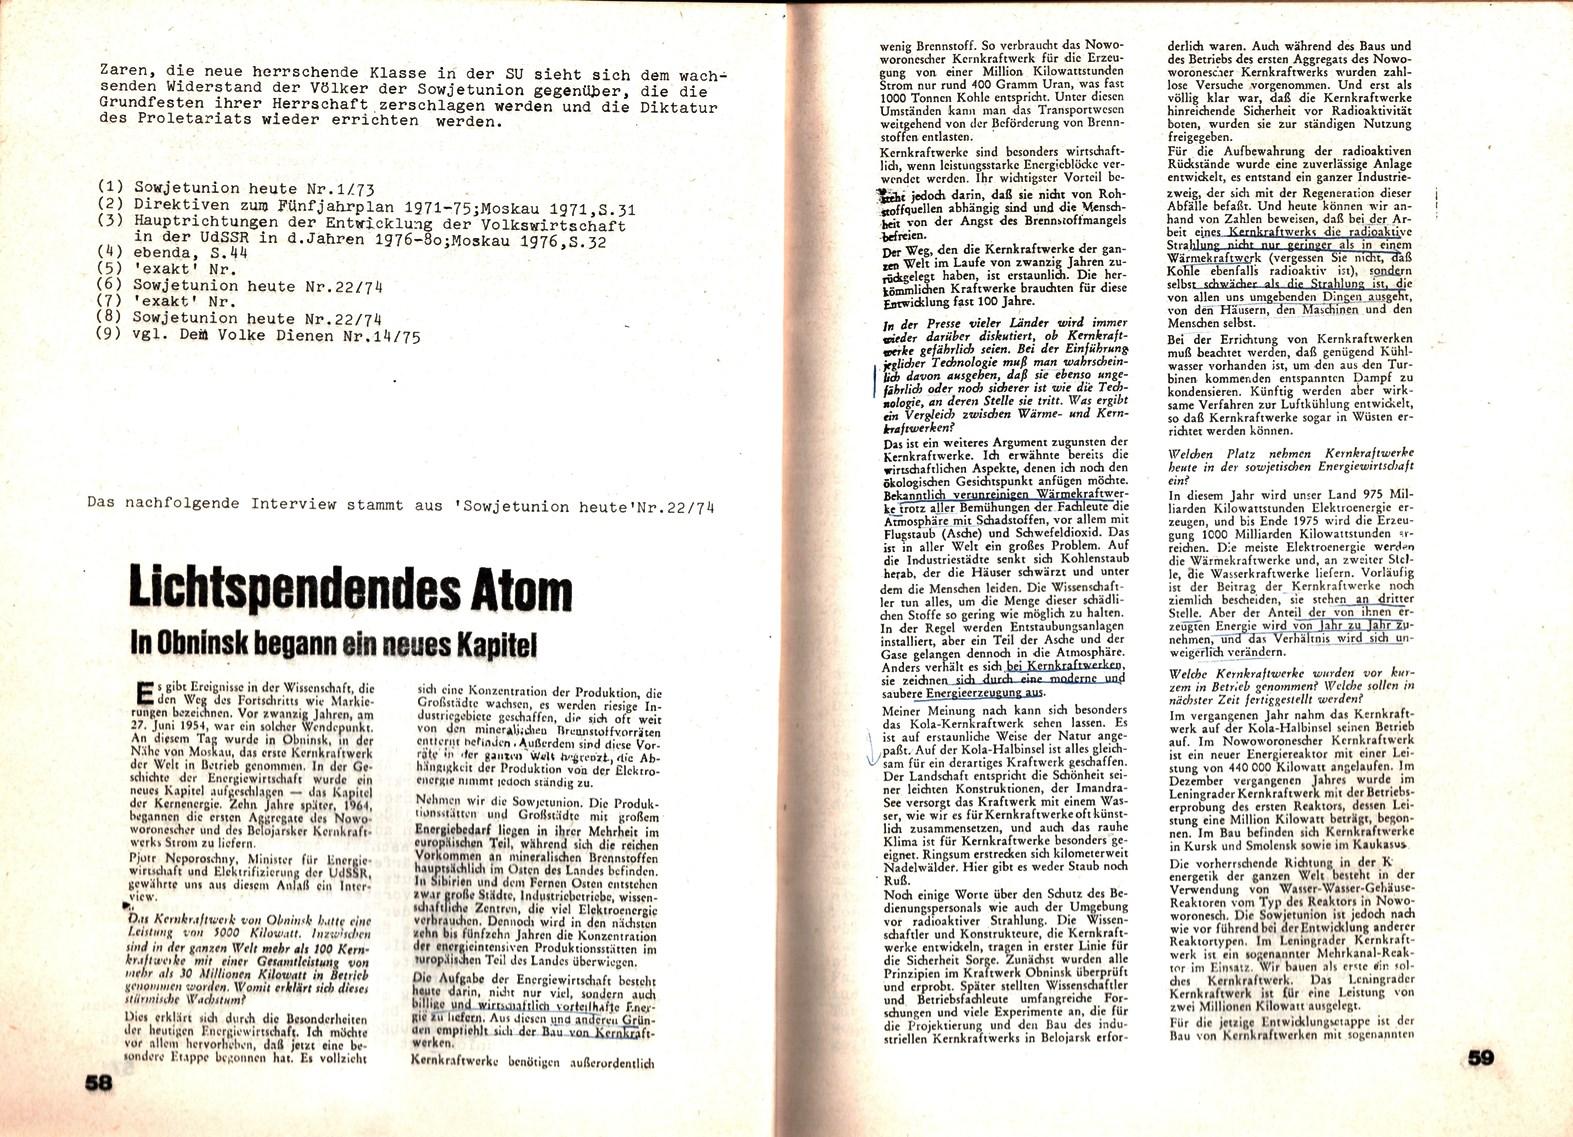 KSV_1976_Atomenergie_im_Kapitalismus_031